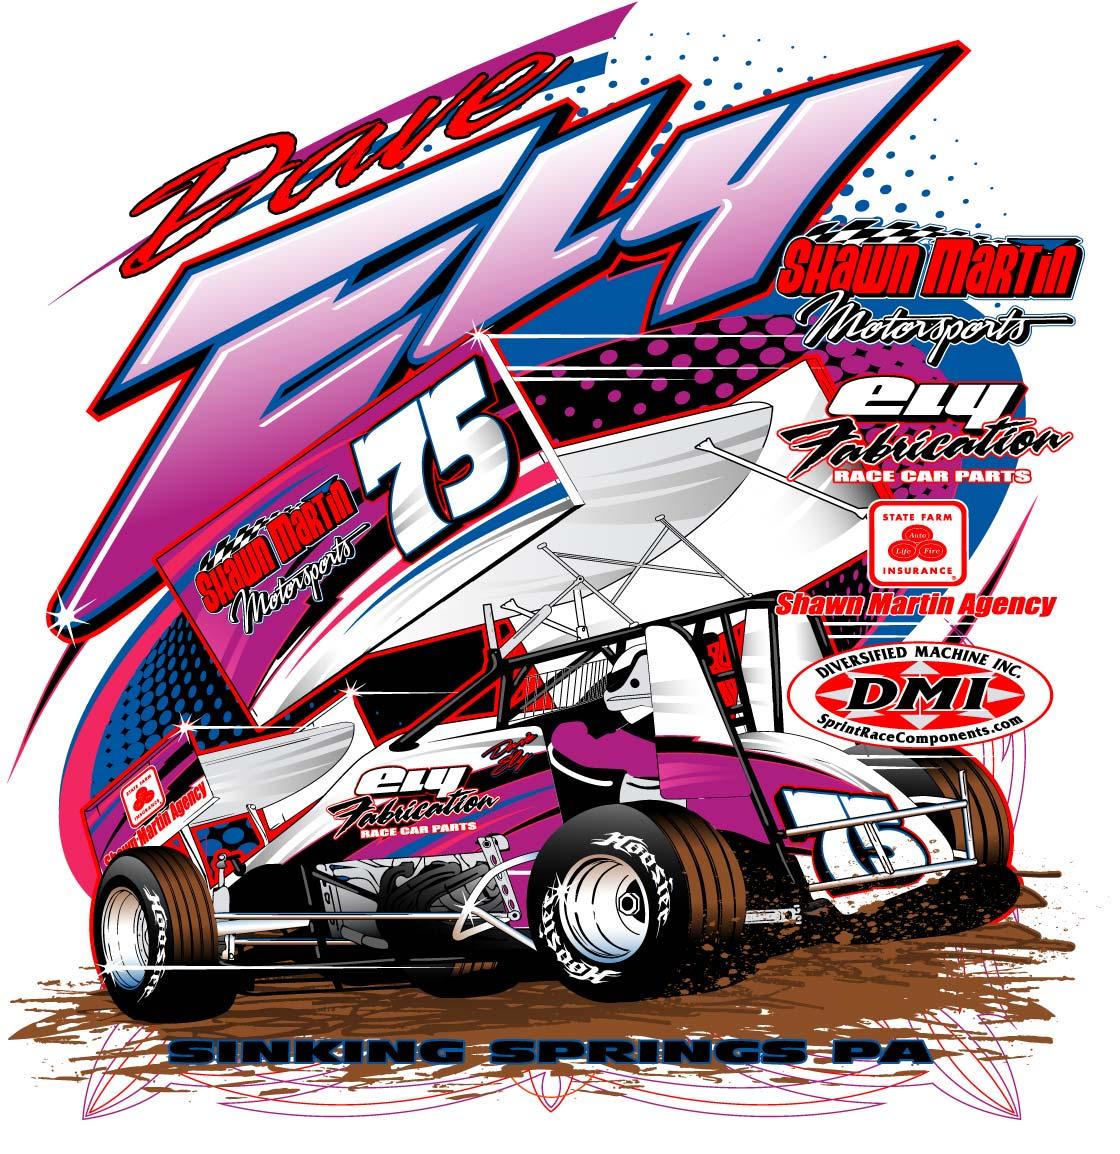 75-Dave-Ely-2010-Shirt-Layout.jpg